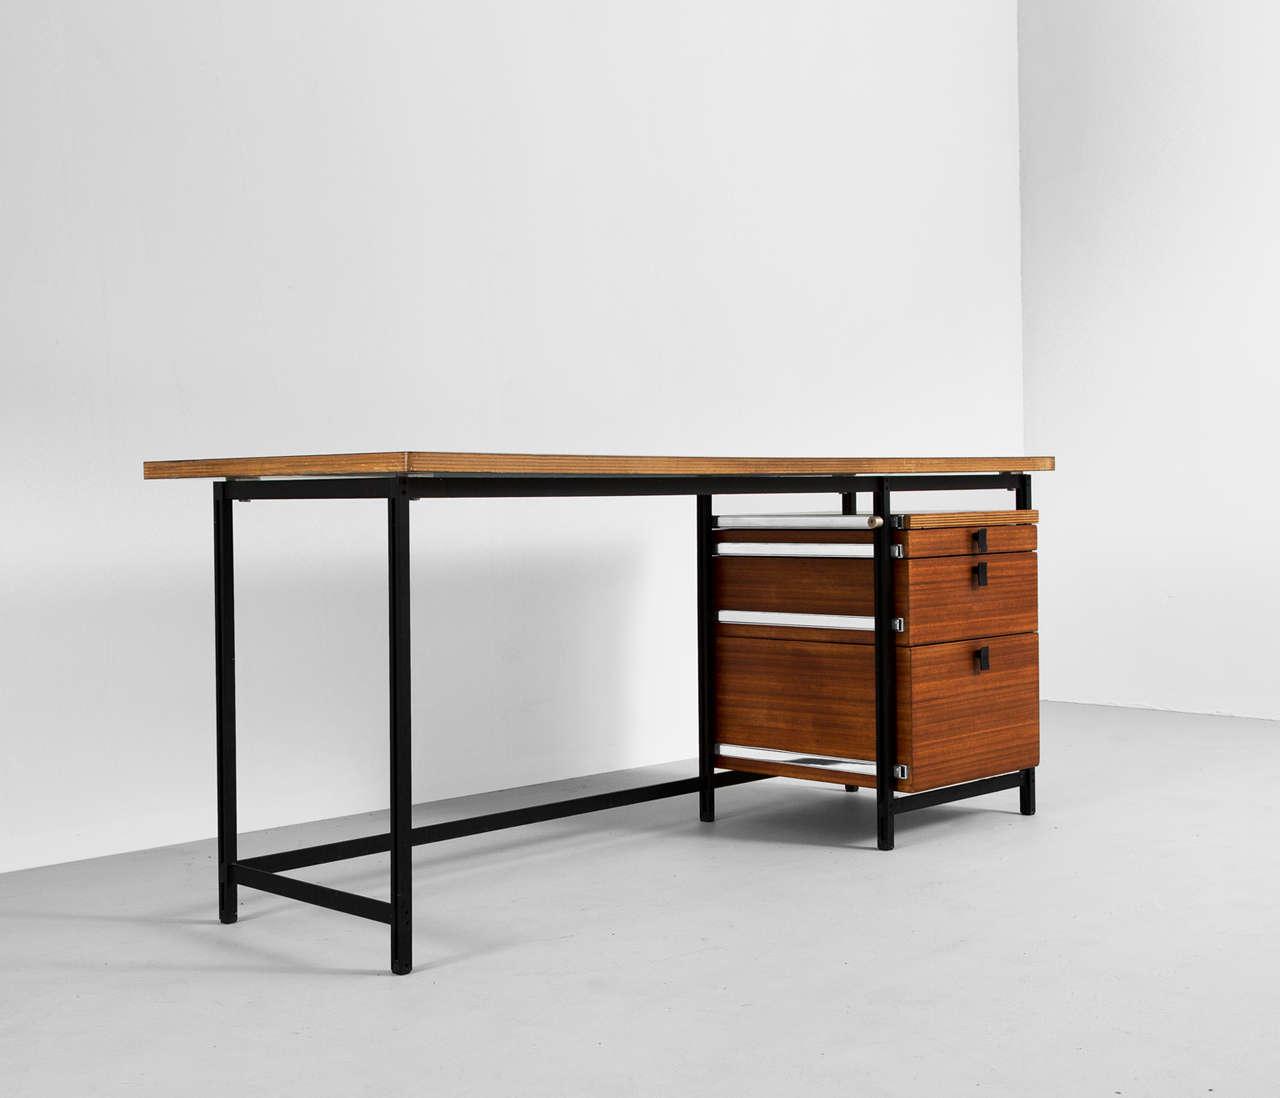 Jules Wabbes Early Black Steel And Dark Teak Desk For Mobilier Universel 3